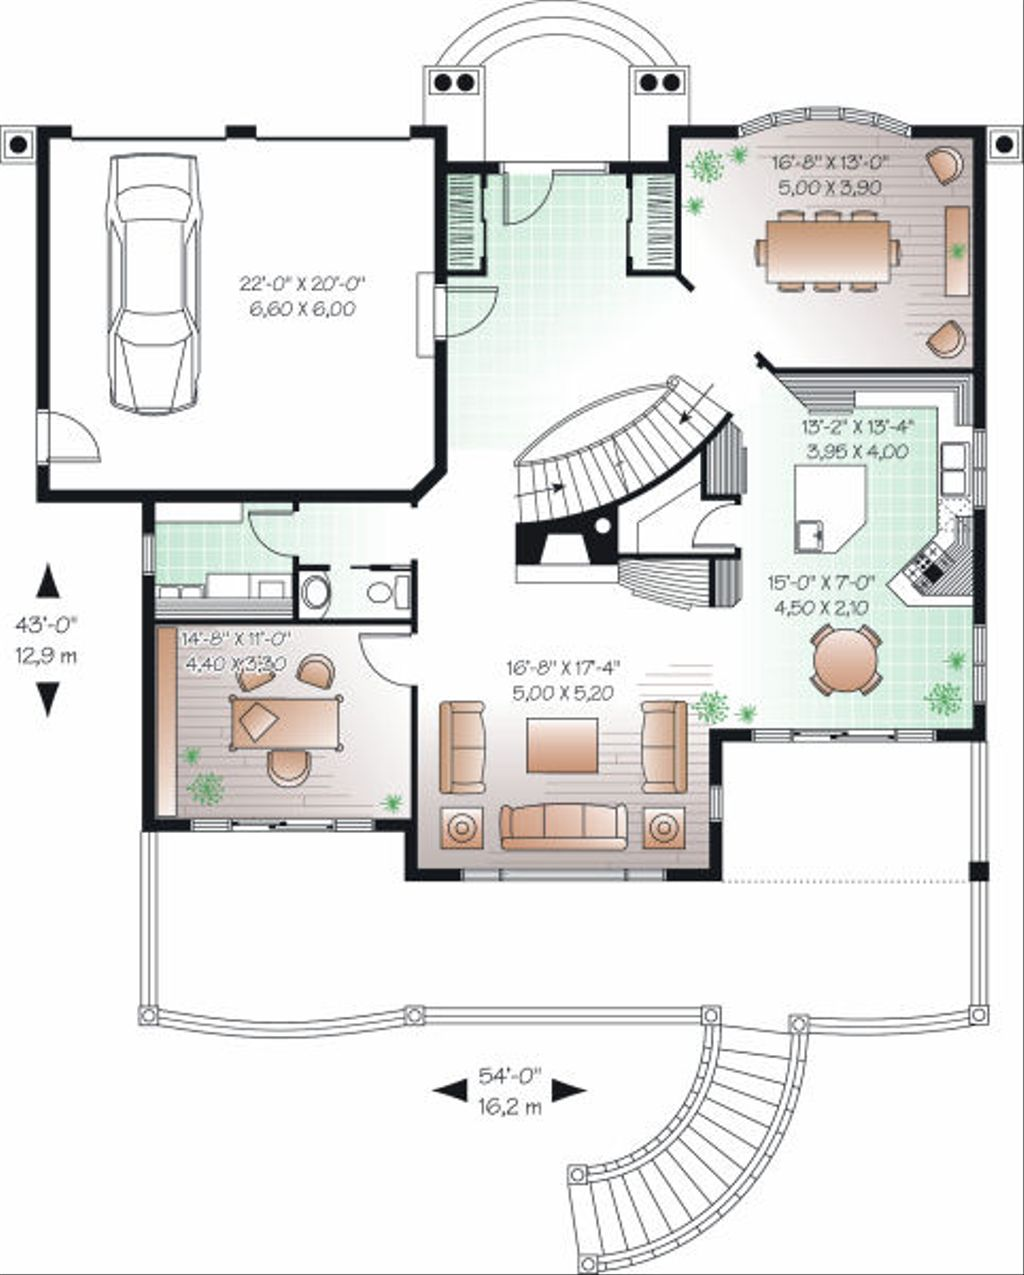 European Style House Plan 5 Beds 3 5 Baths 3251 Sq Ft